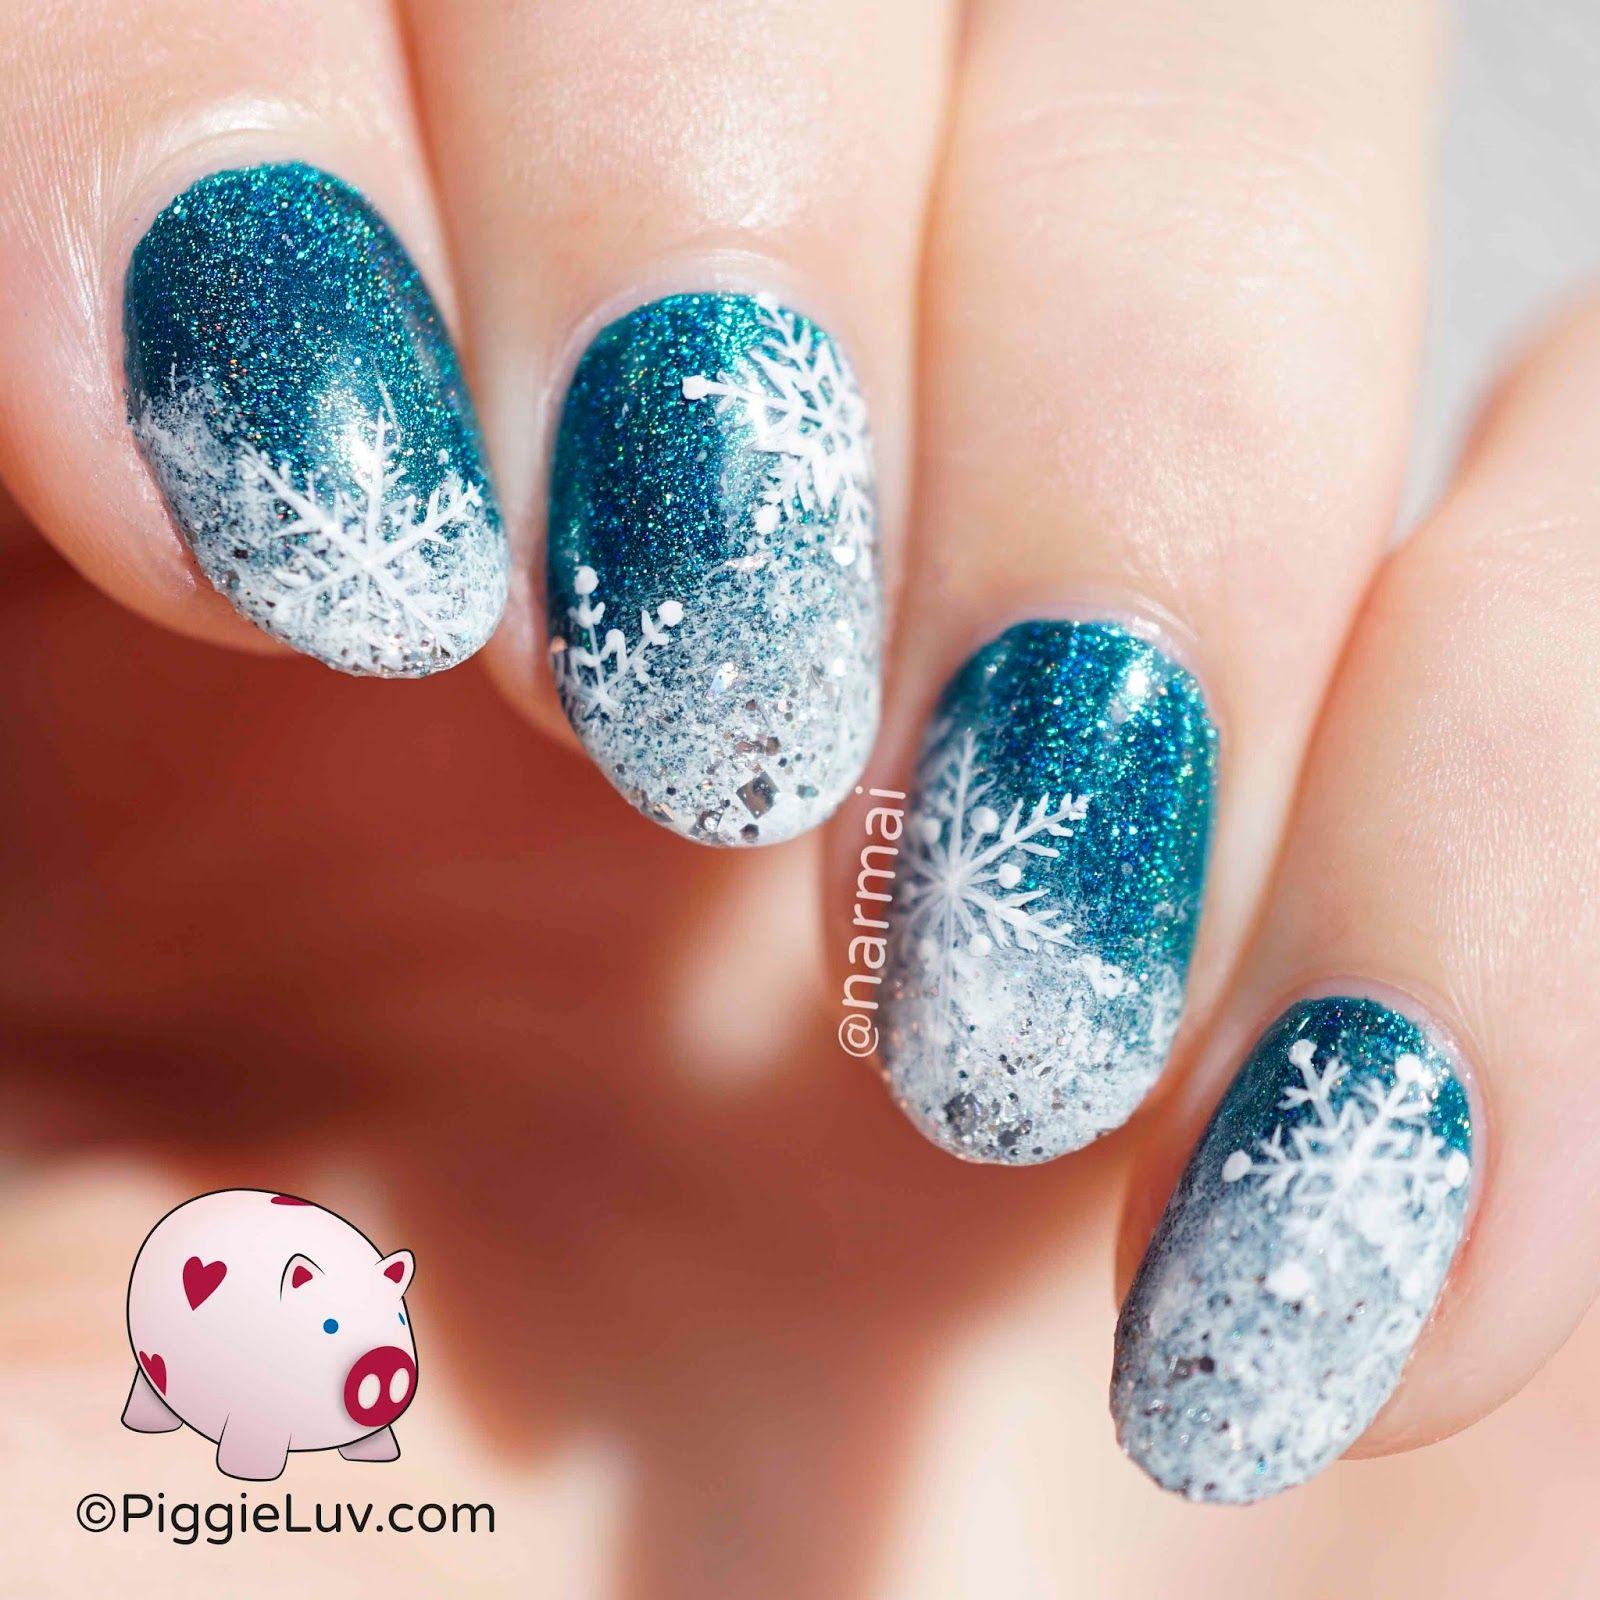 Flakage snow nail art tutorial snow nails art tutorials and snow nail art tutorial prinsesfo Images